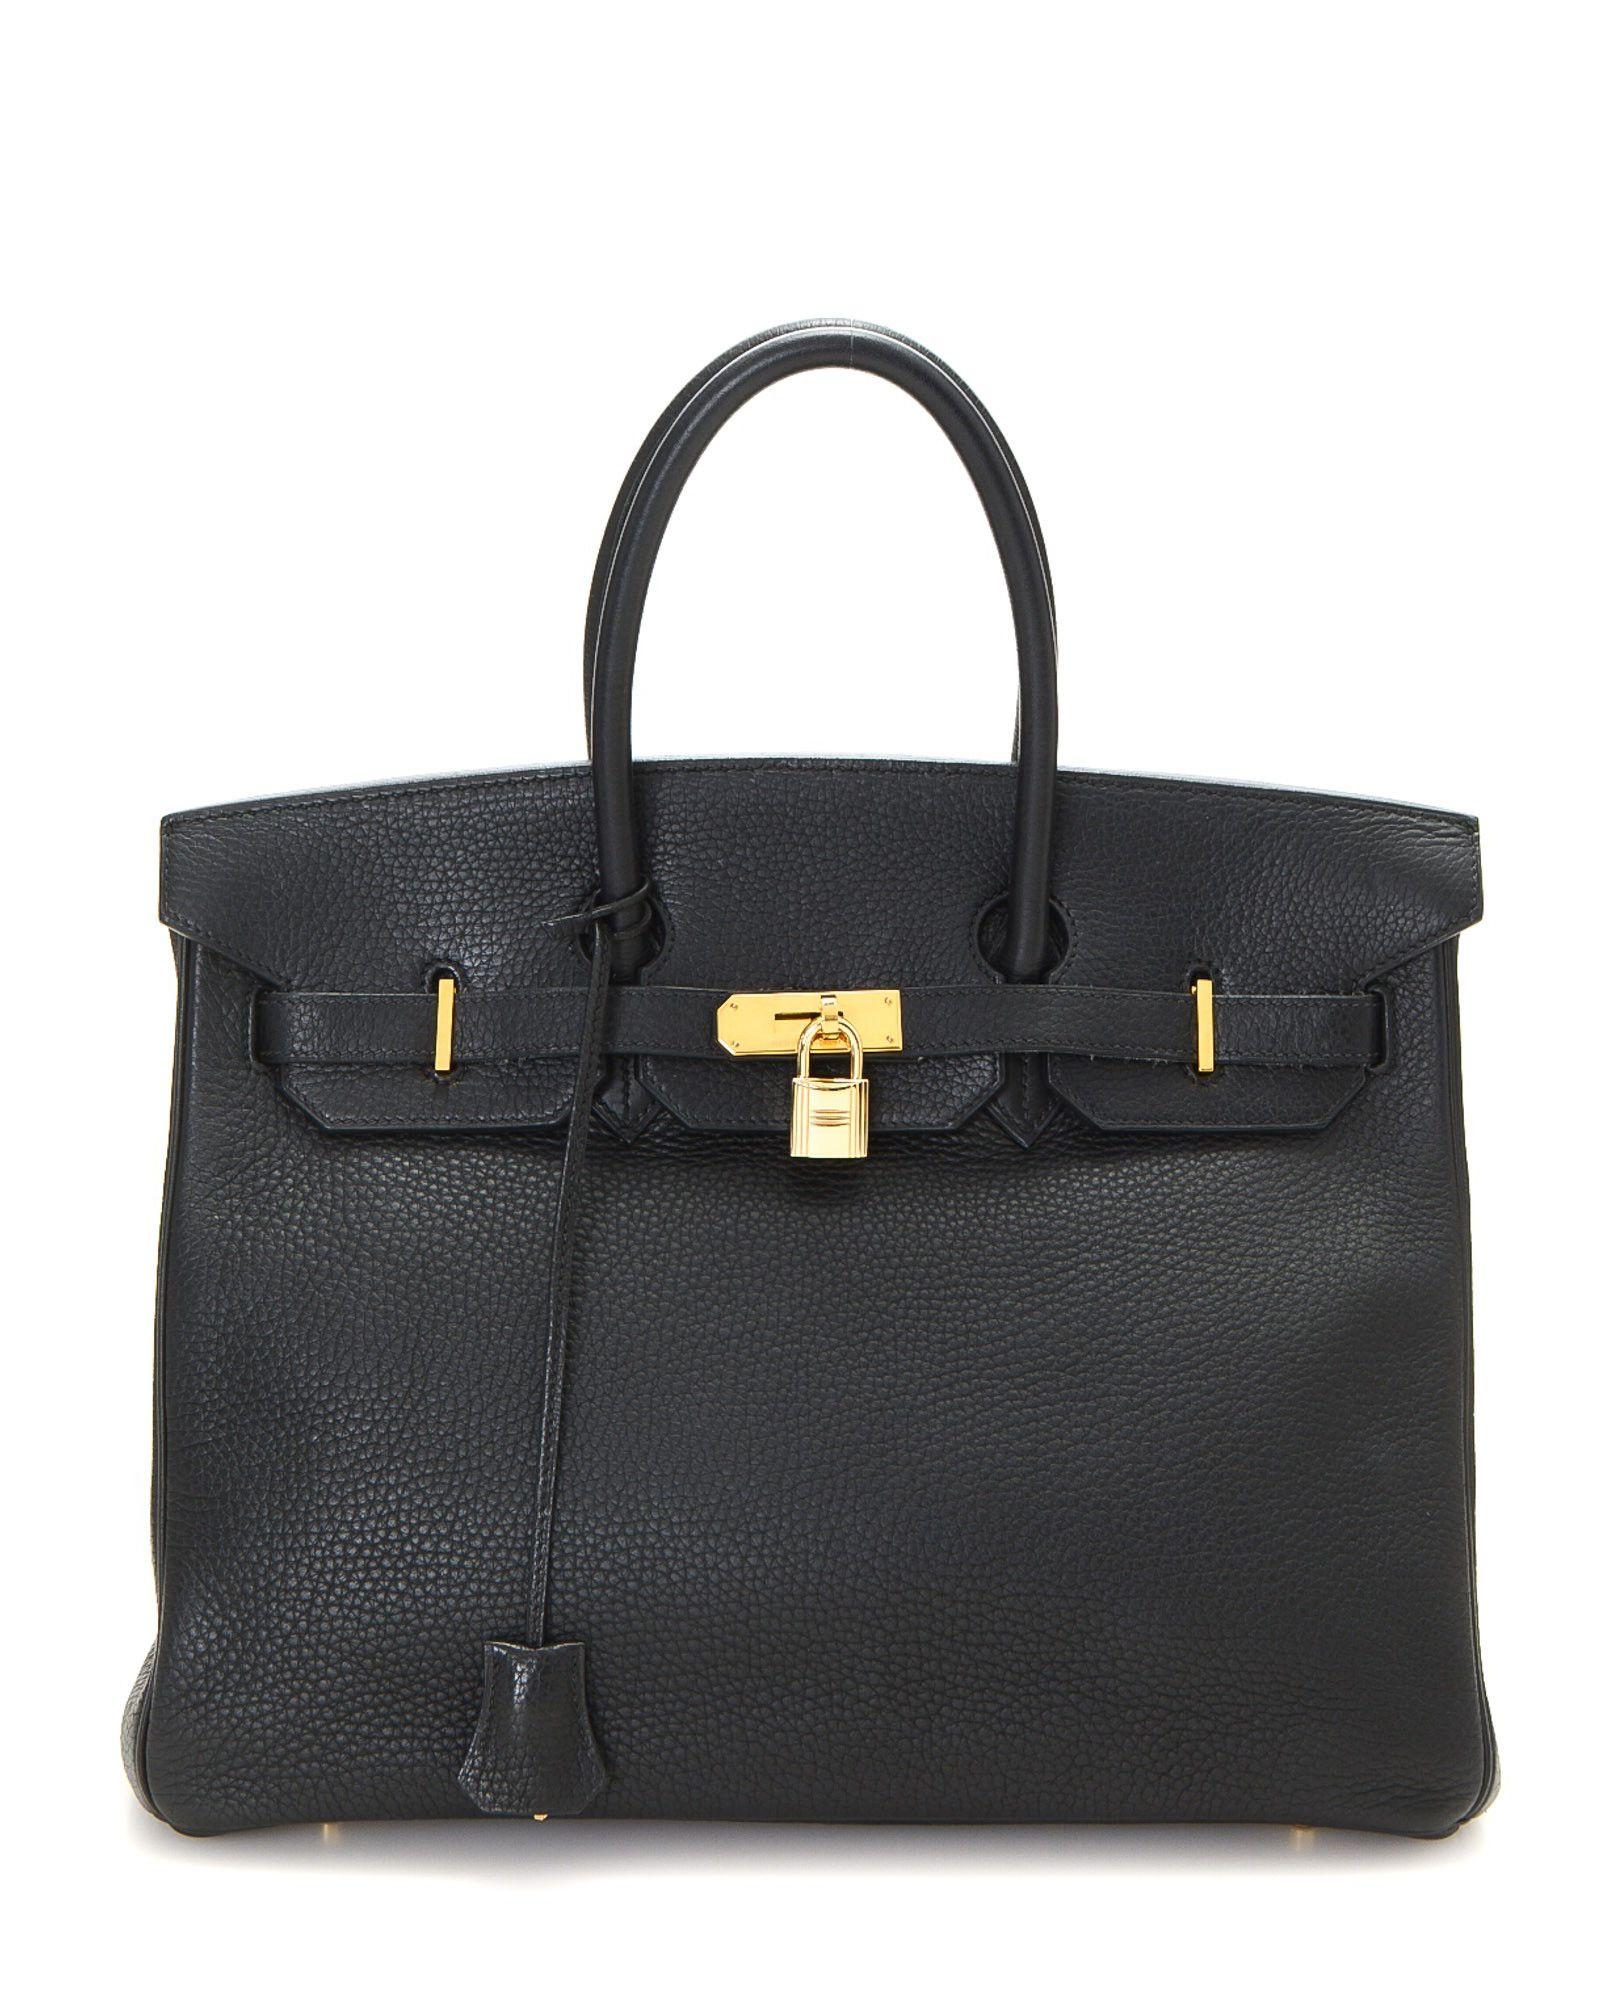 Hermes Birkin 35 Handbag - Vintage Hermes Birkin f3512ea7f5b5d